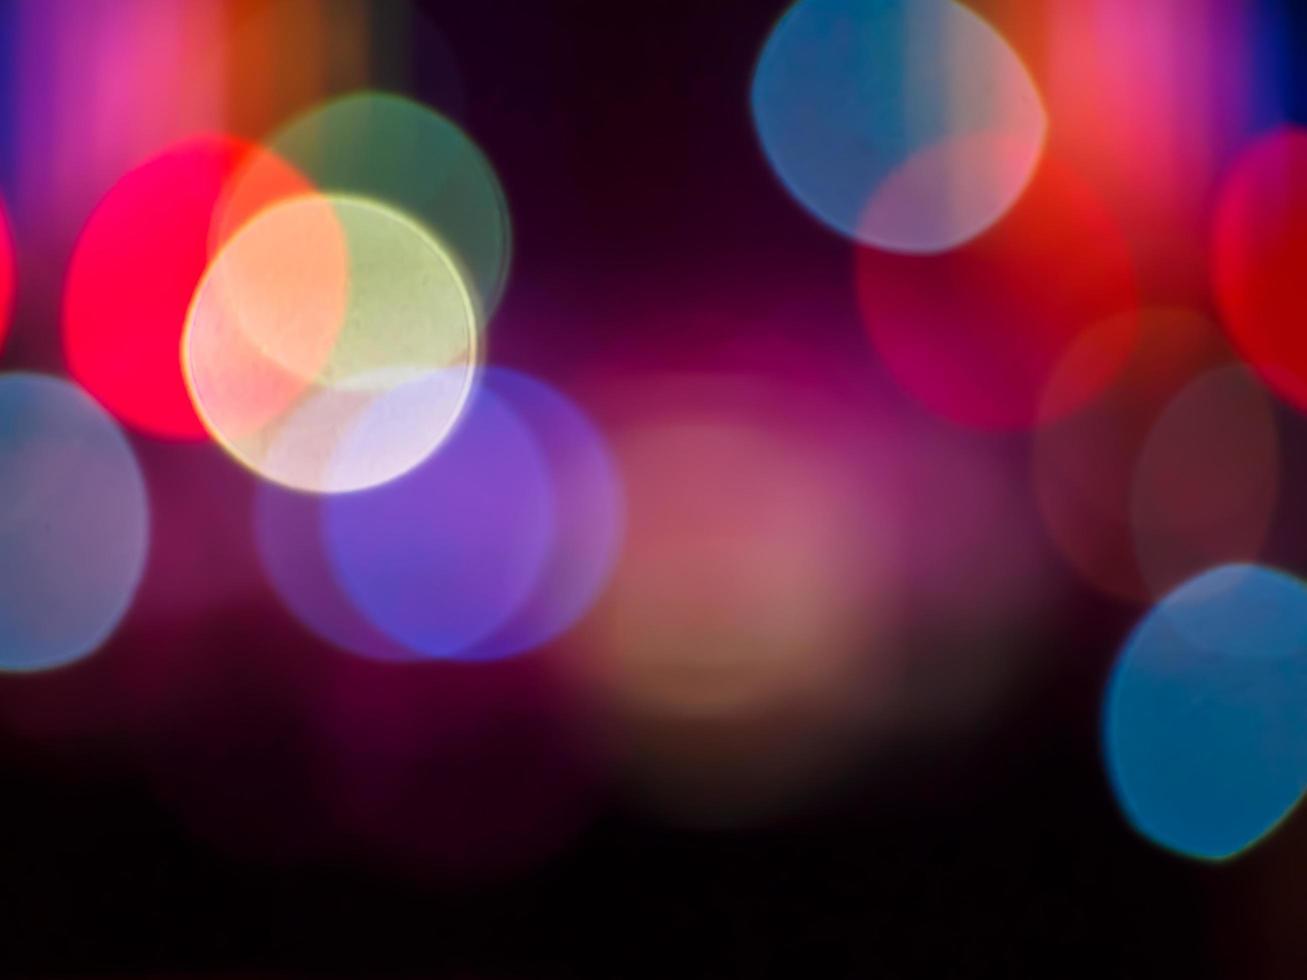 mjuka bokehljus på mörk bakgrund foto